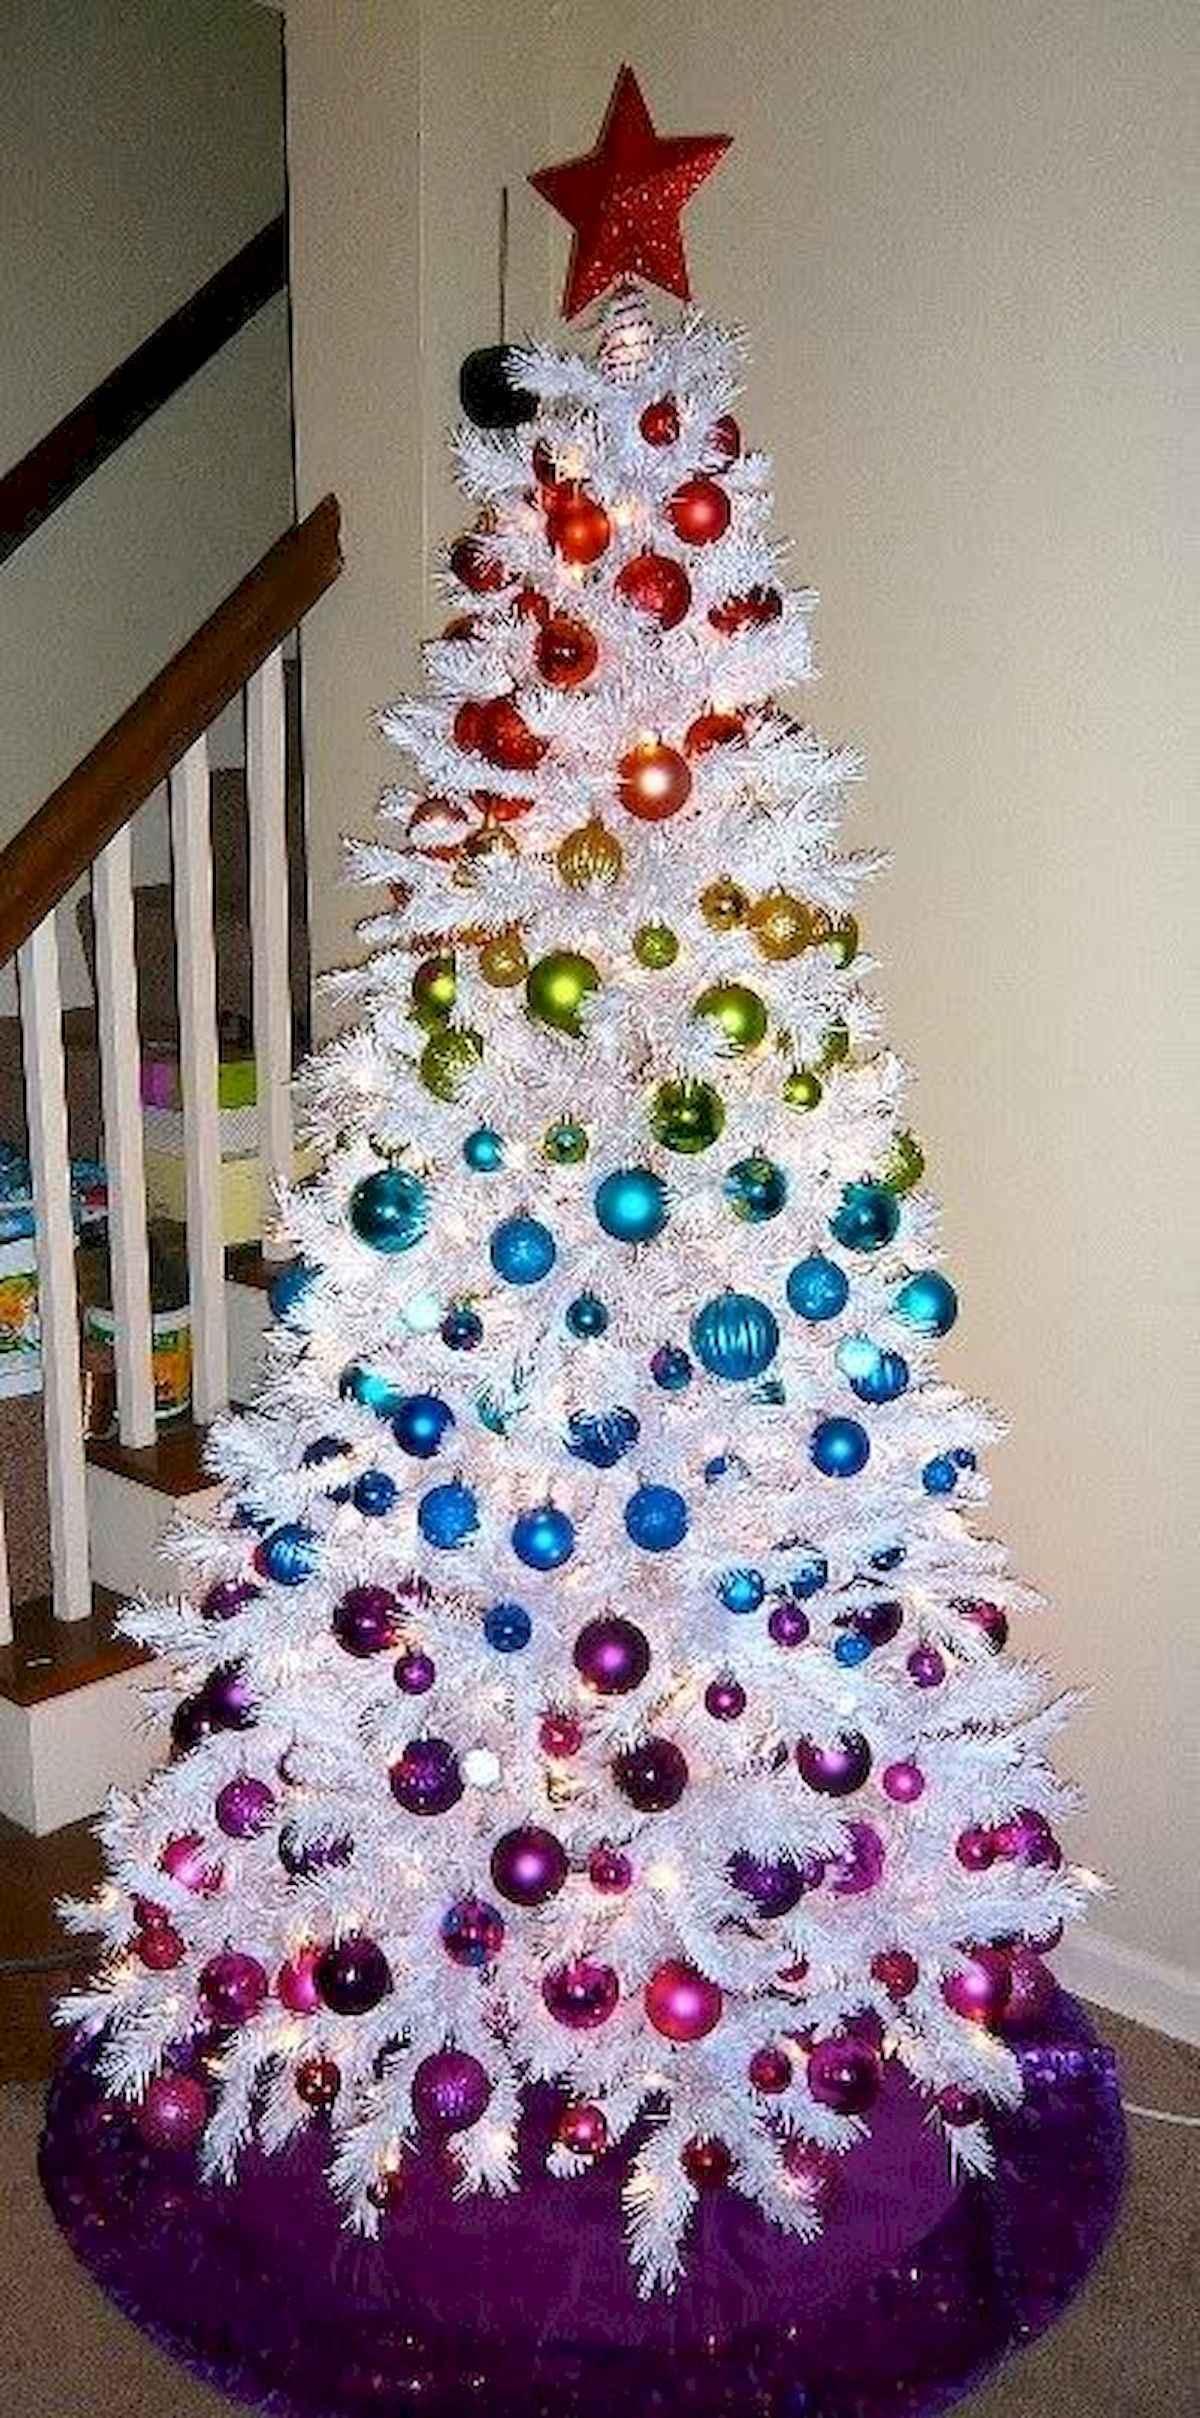 40 unique christmas tree ideas decorations (30)